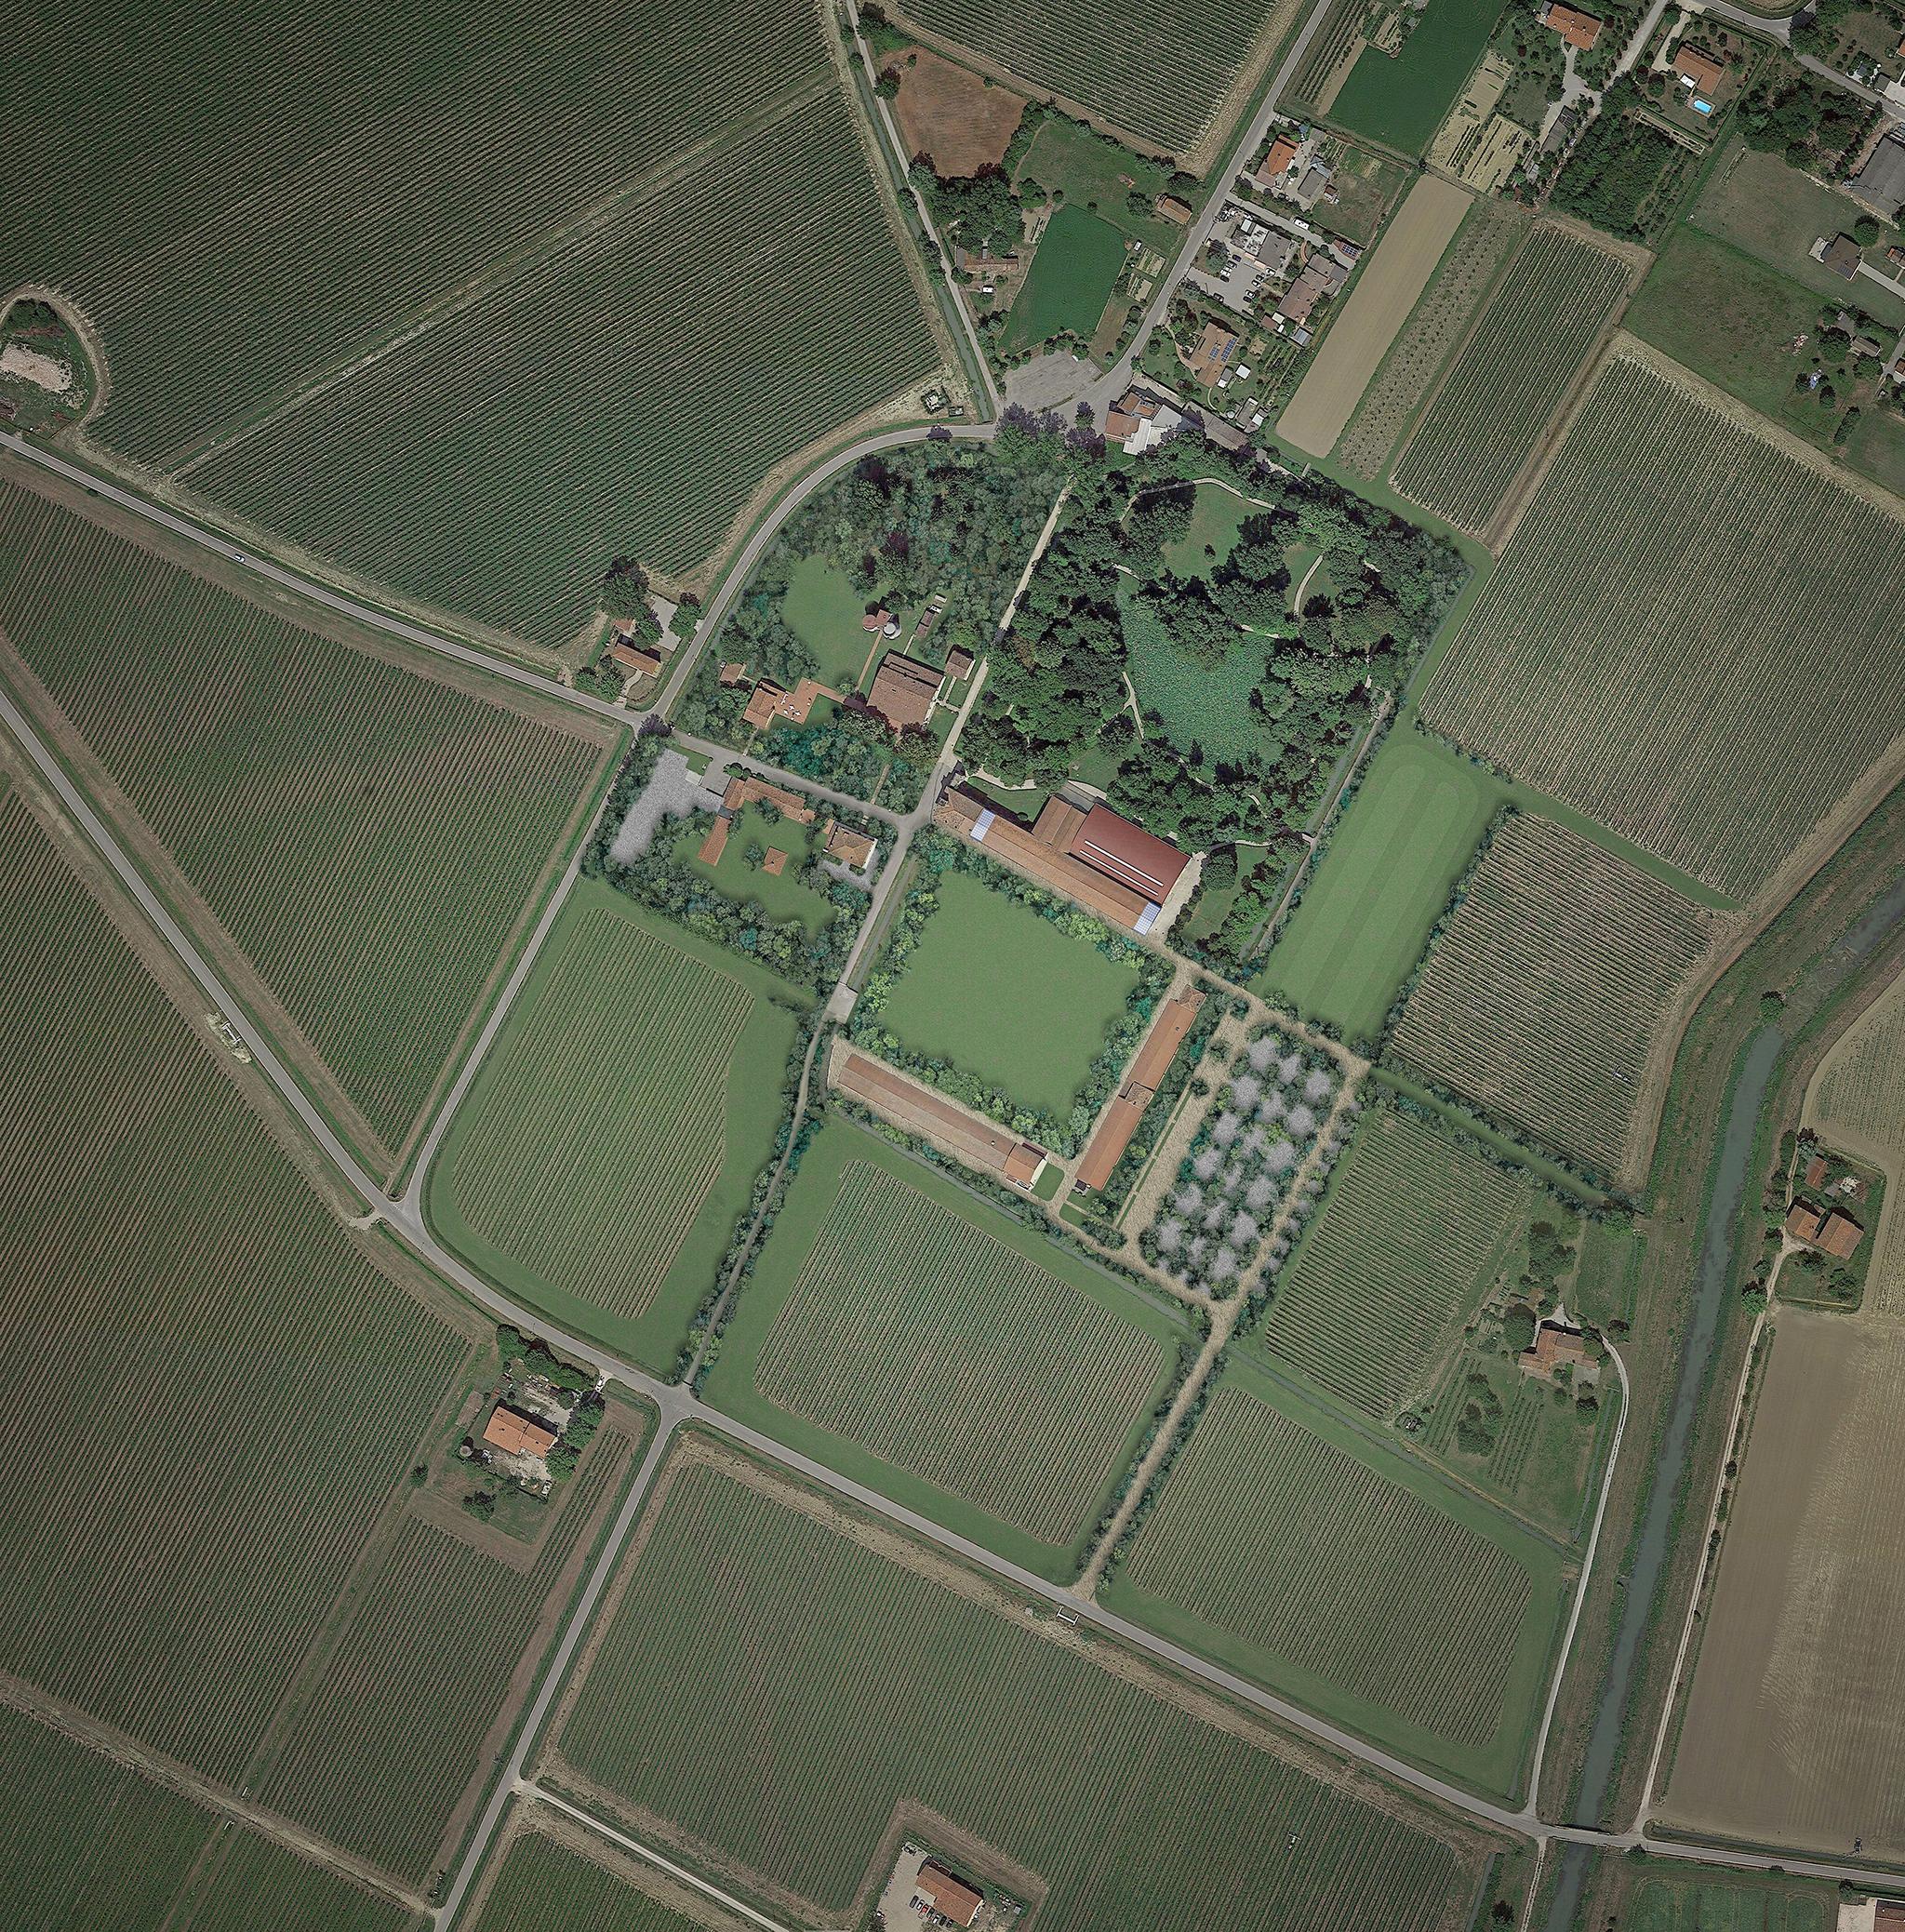 tenuta-agricola-ca-tron-04.jpg